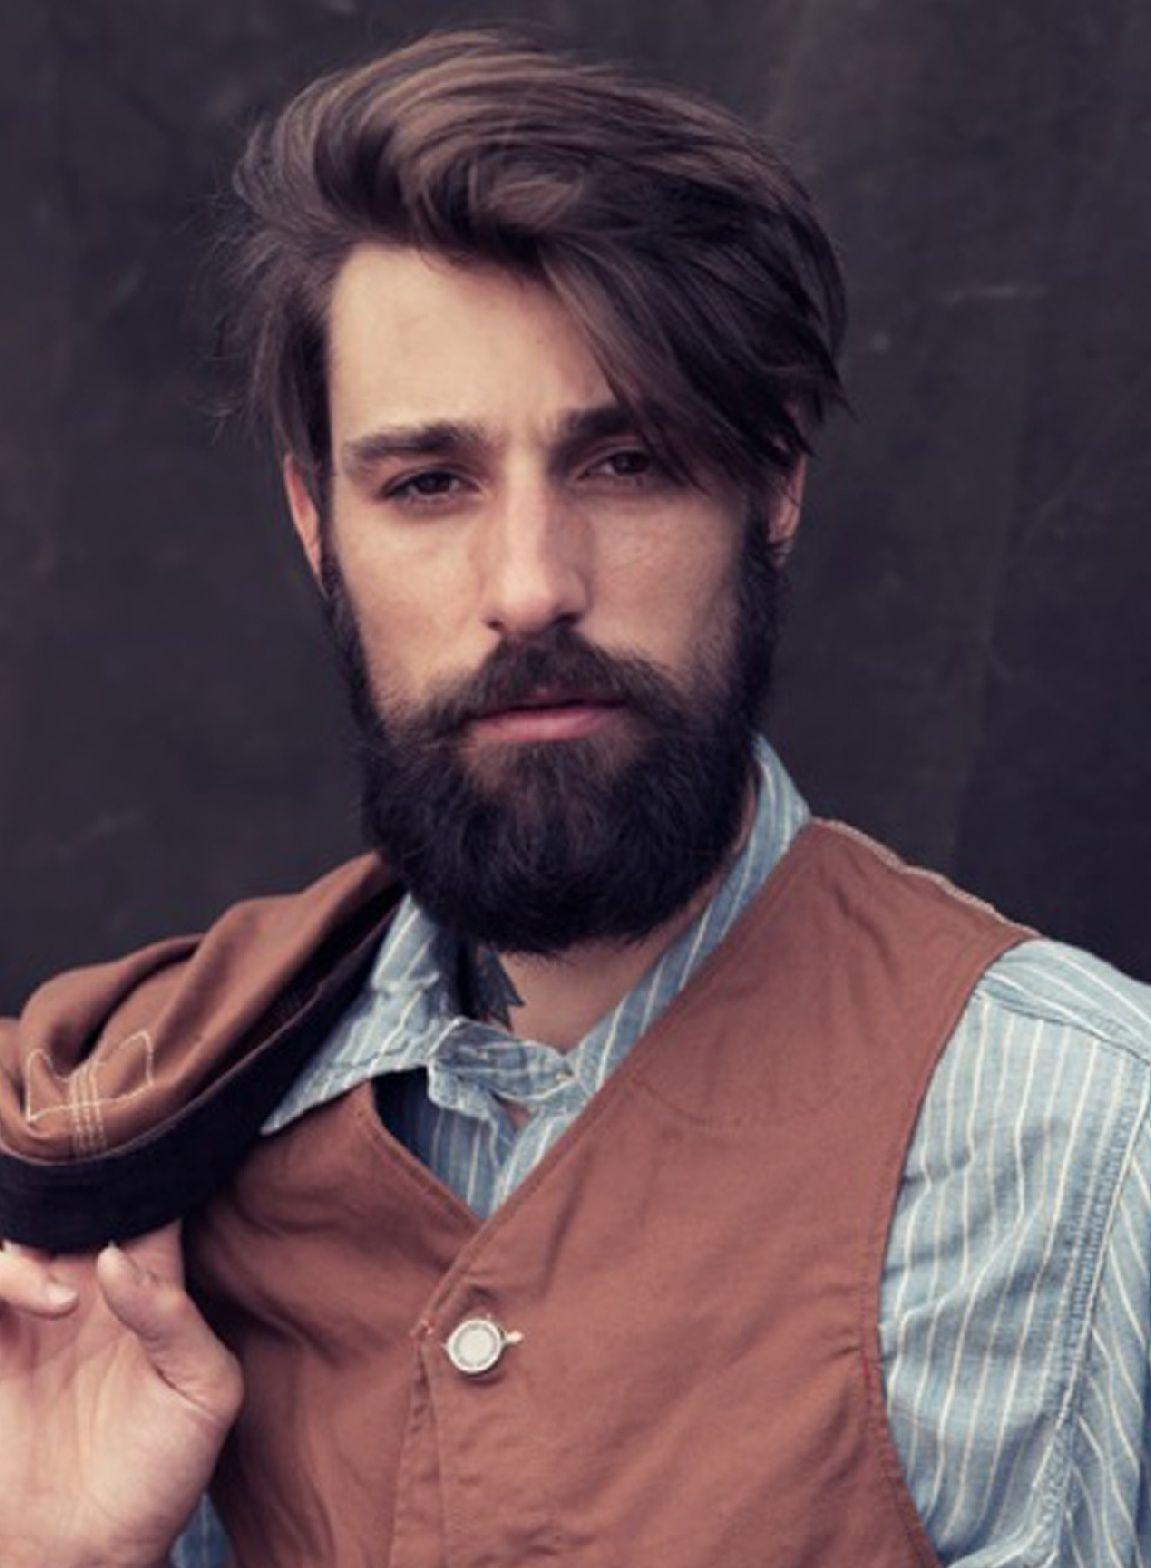 193 + slicked back undercut hairstyle | undercut | beard no